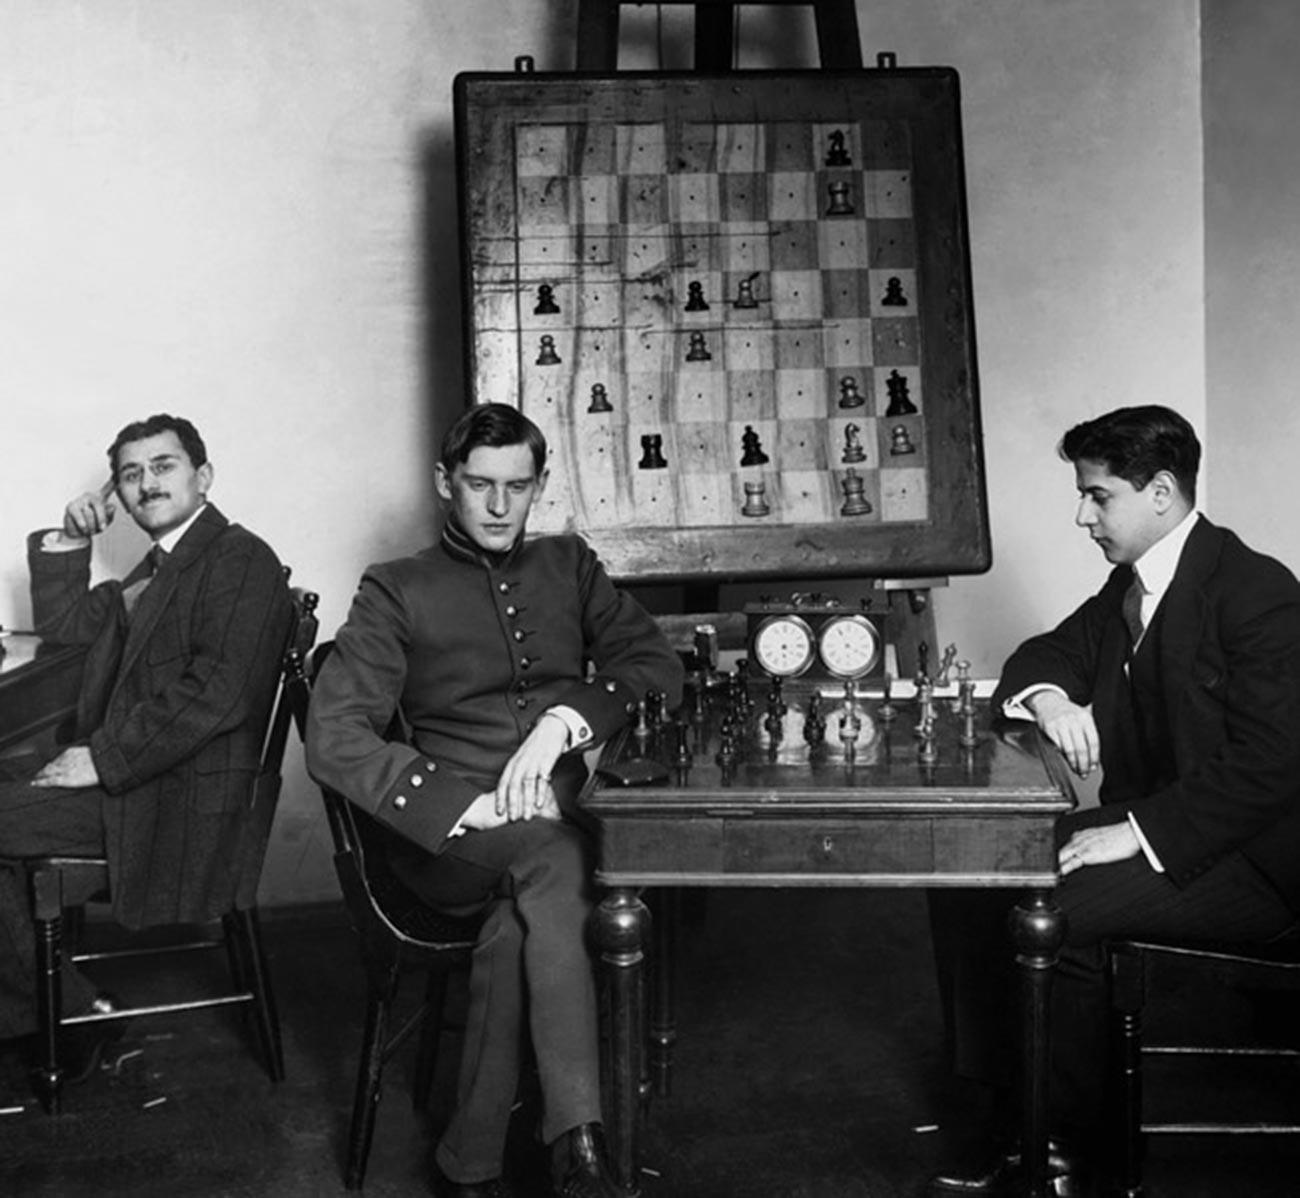 Alekhine vs José Raúl Capablanca, 1914.